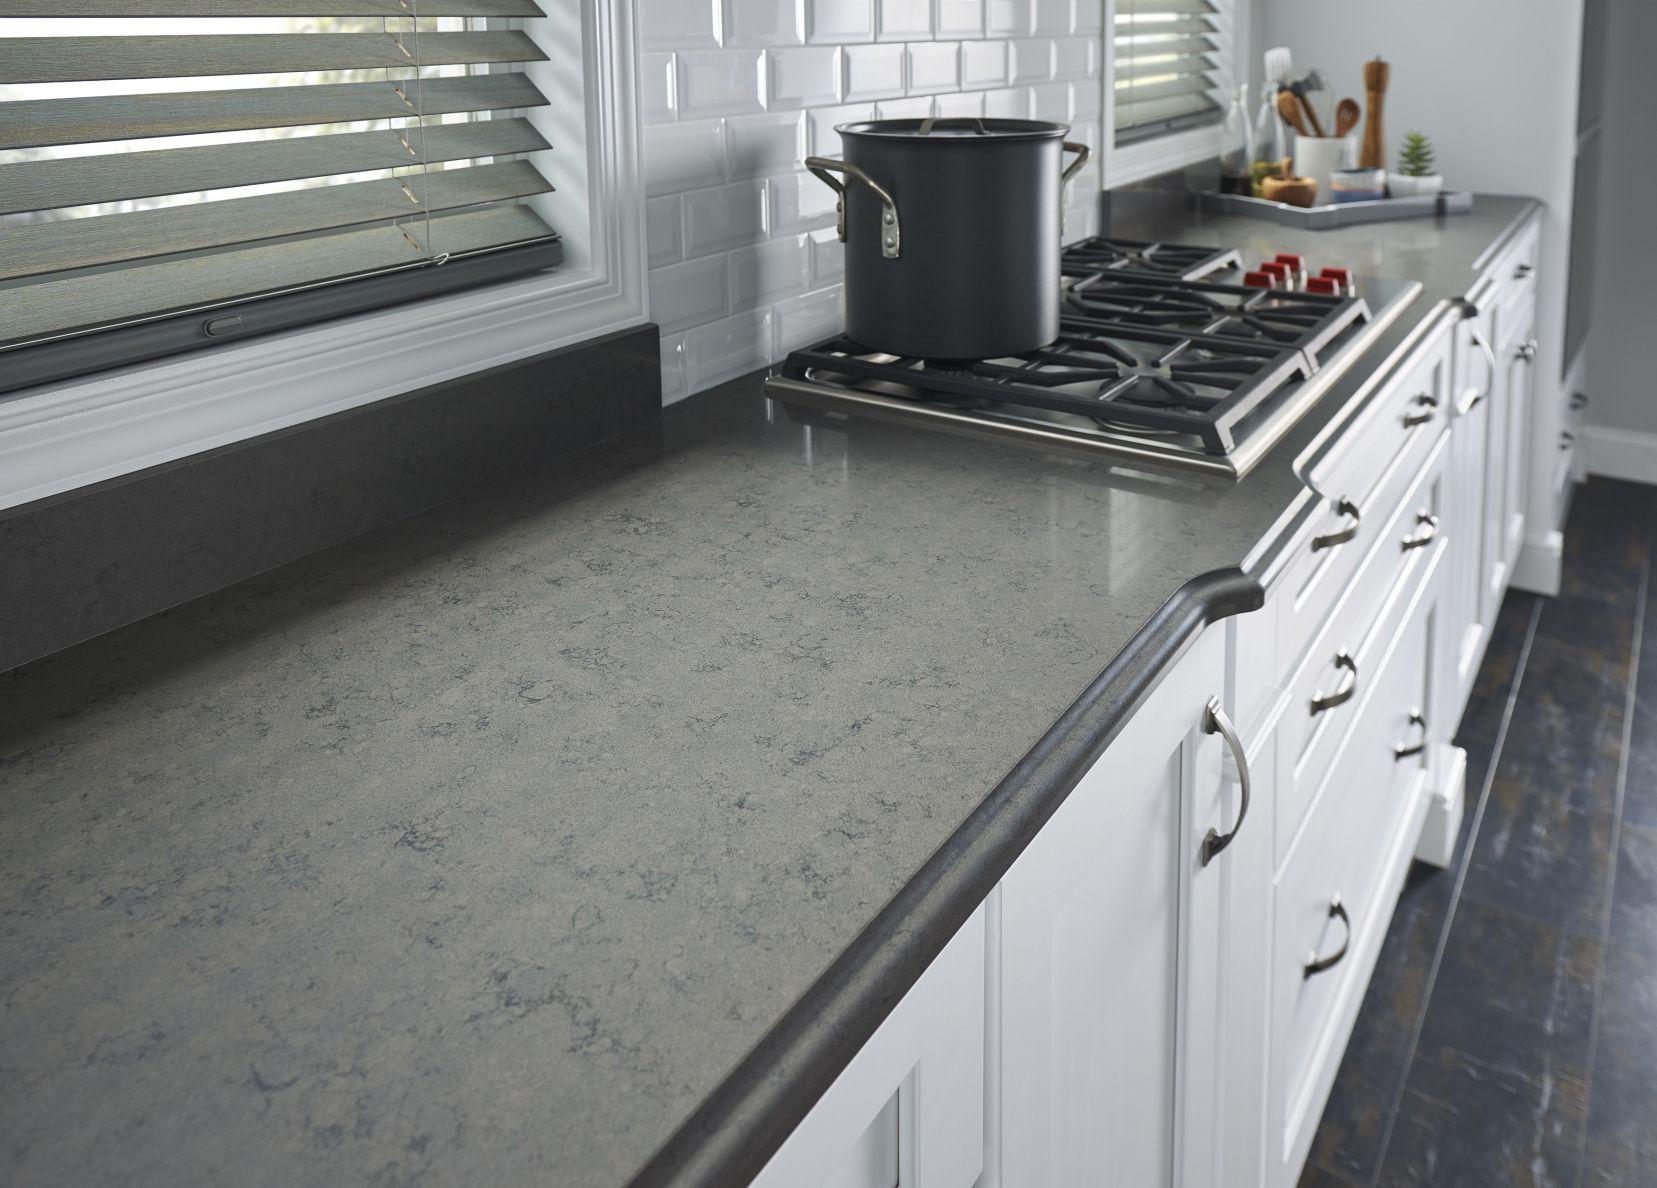 how to care for viatera quartz countertops